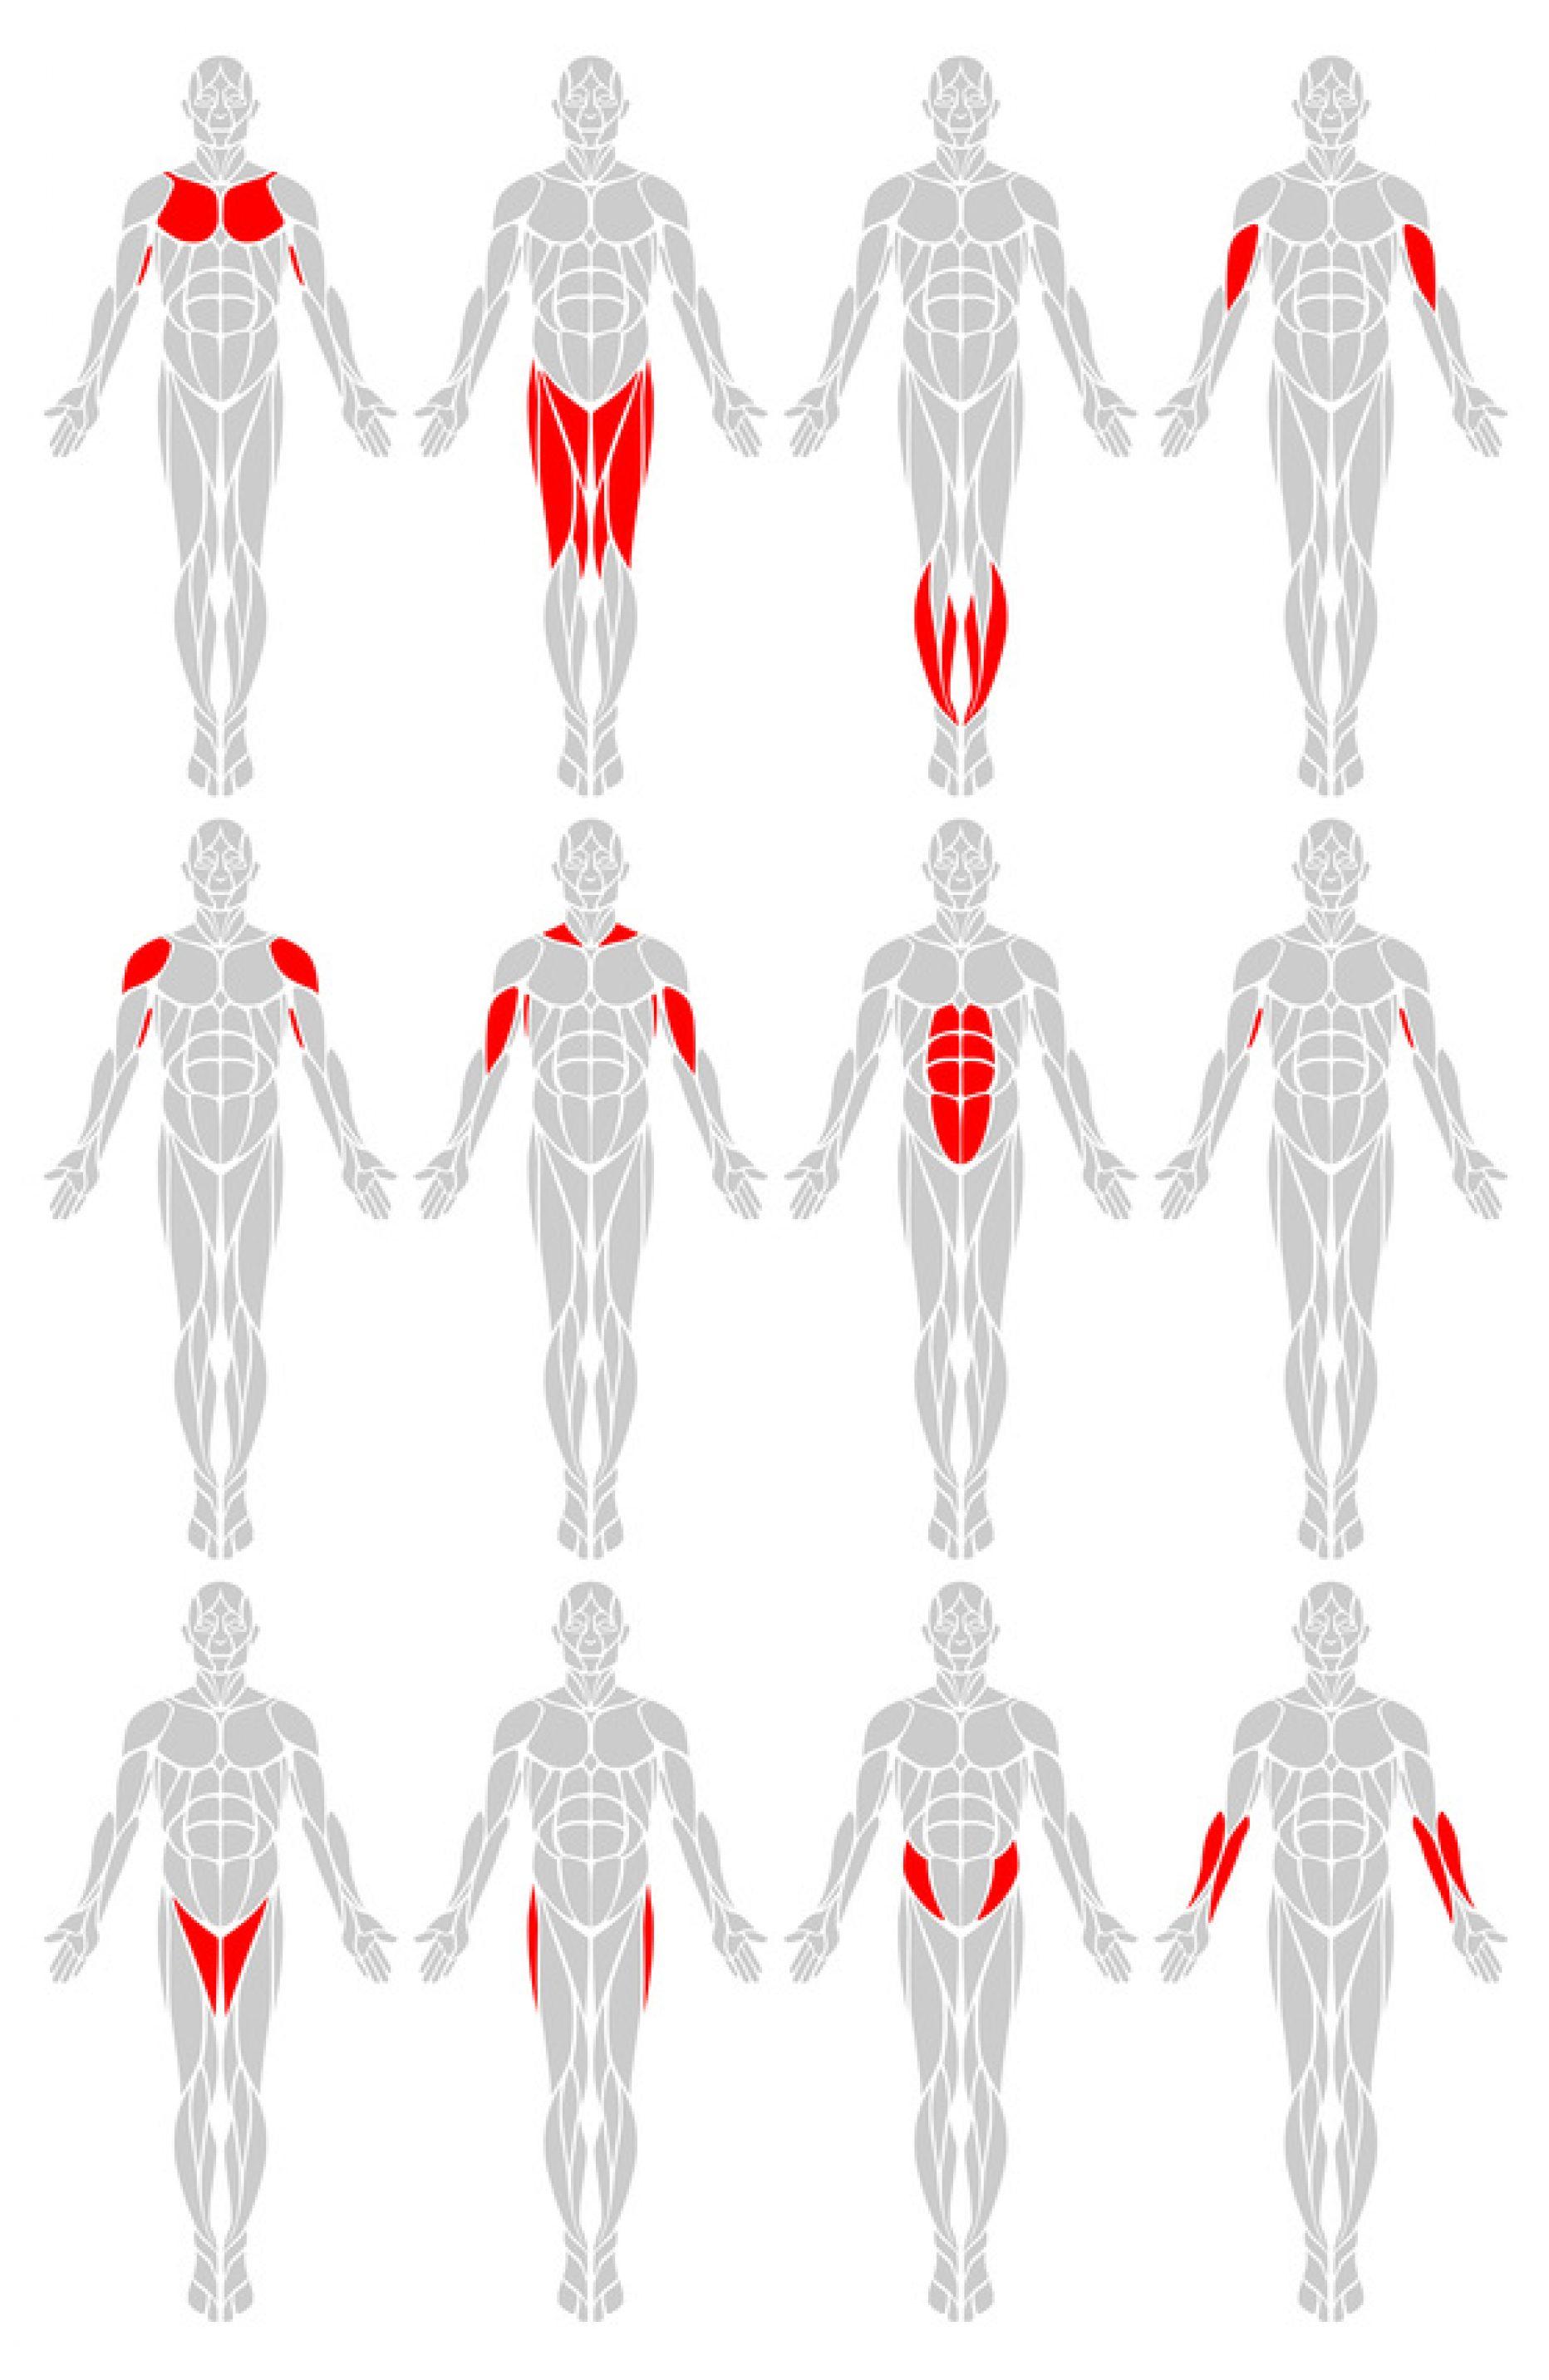 Barwniki i muskuły